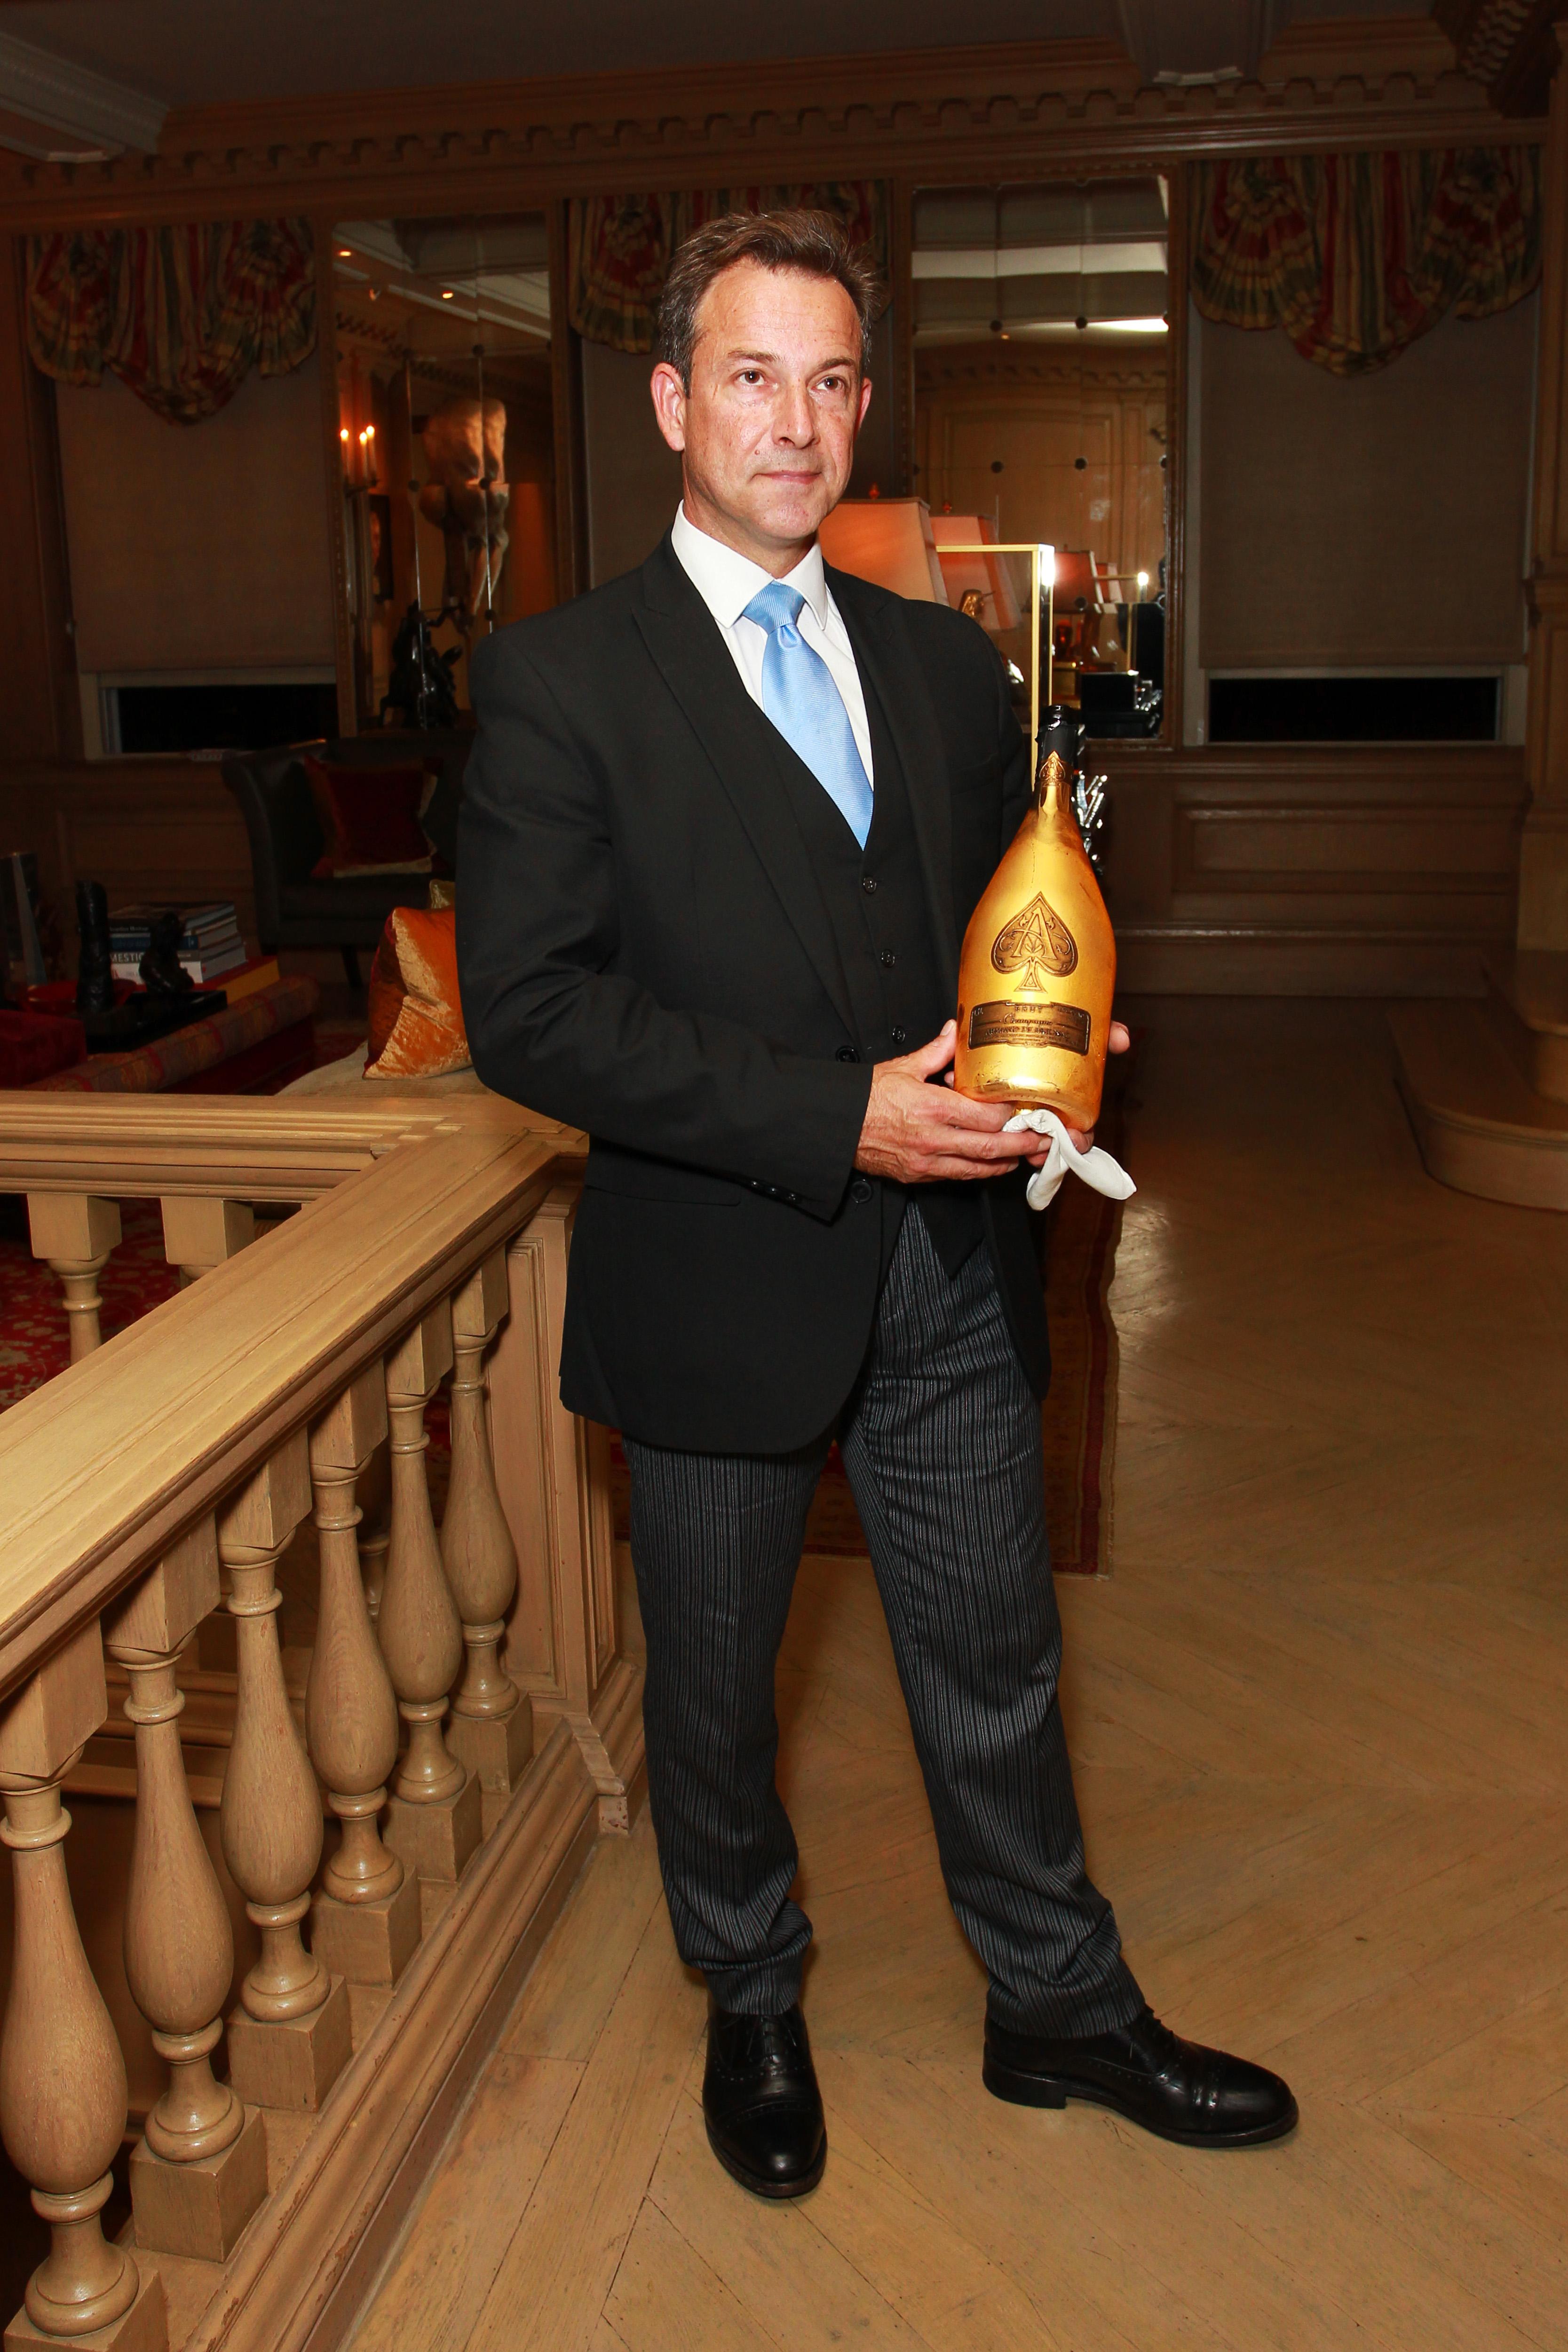 ART COLLECTOR KAMIAR MALEKI AND ARMAND DE BRIGNAC HOST PRESTIGE CHAMPAGNE DINNER, CELEBRATING THE LONDON ART WEEK AND FRIEZE ART FAIR - Armand de Brignac Champagne